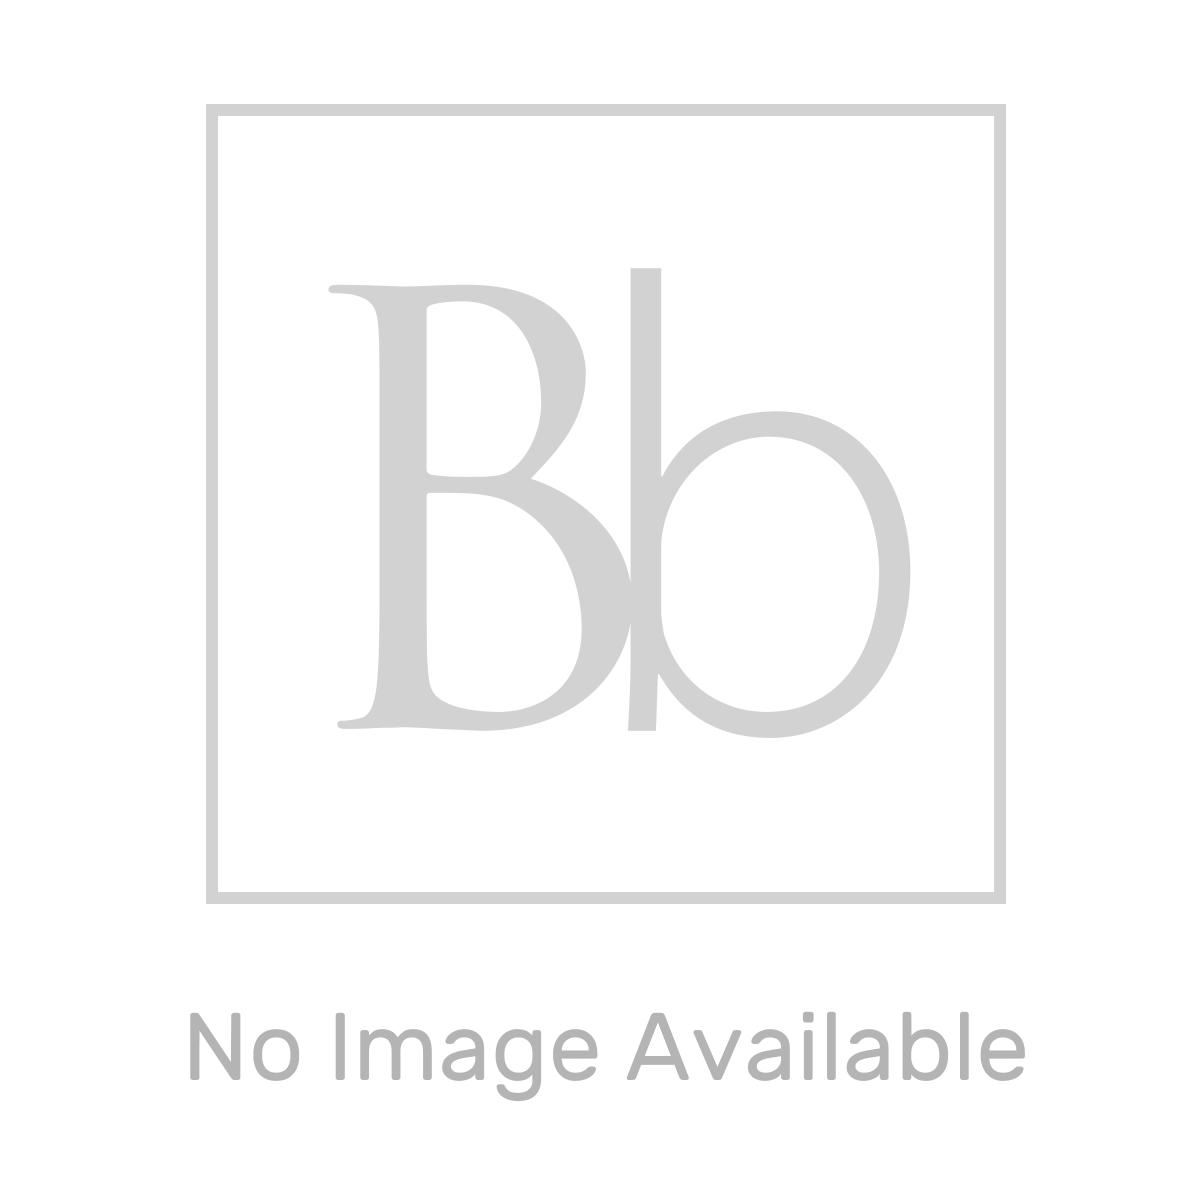 Ikoma White Gloss Vanity Unit with Basin 750mm